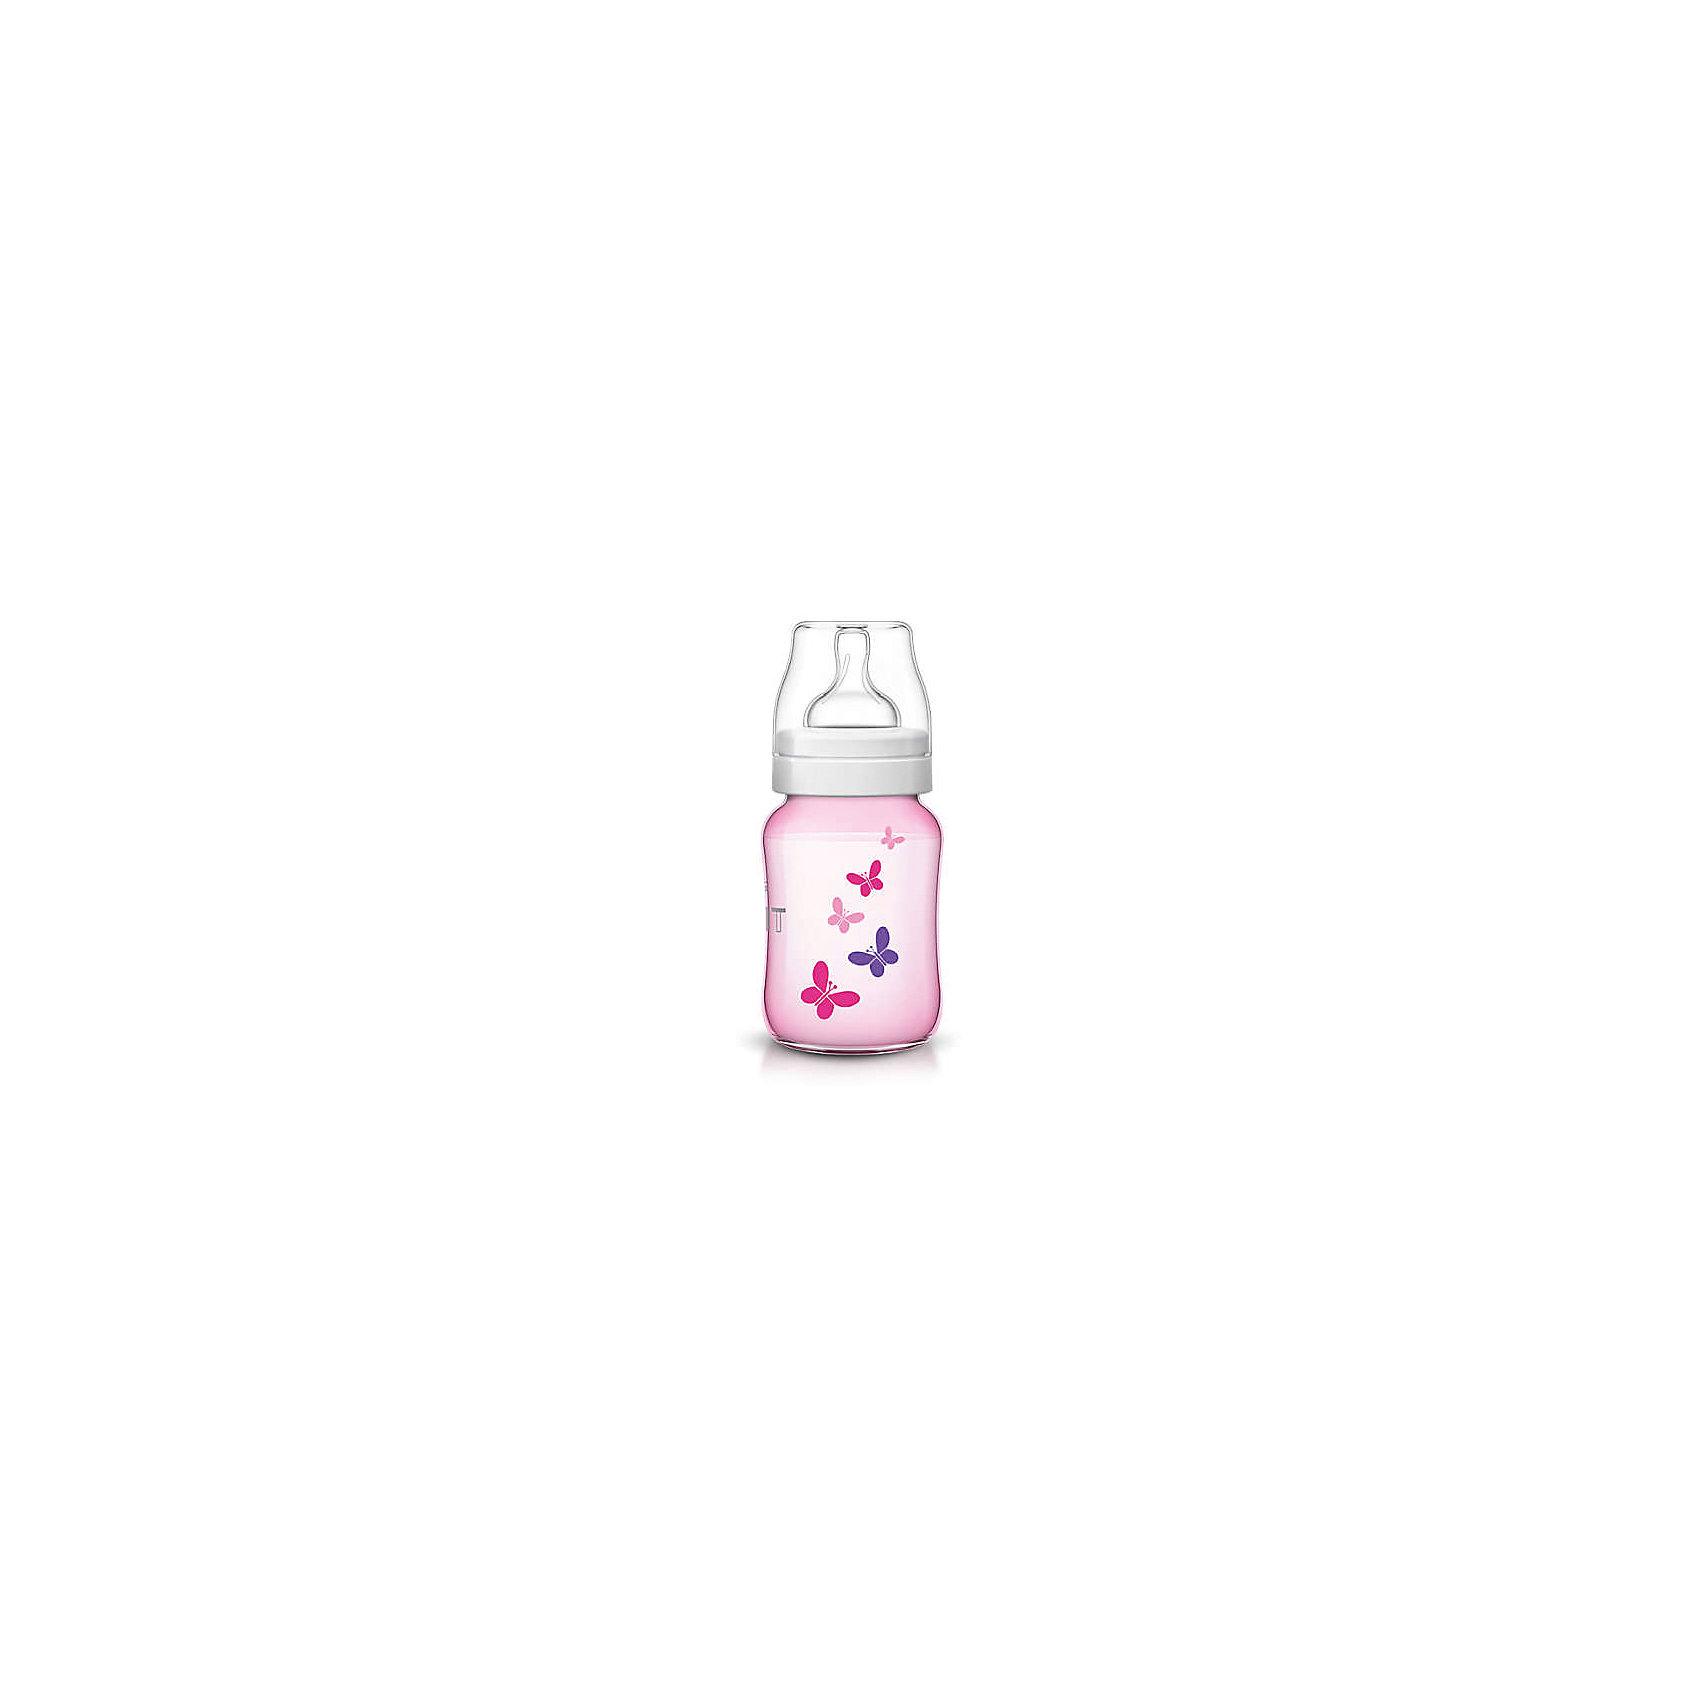 PHILIPS AVENT Бутылочка для кормления Бабочка 260мл, Avent